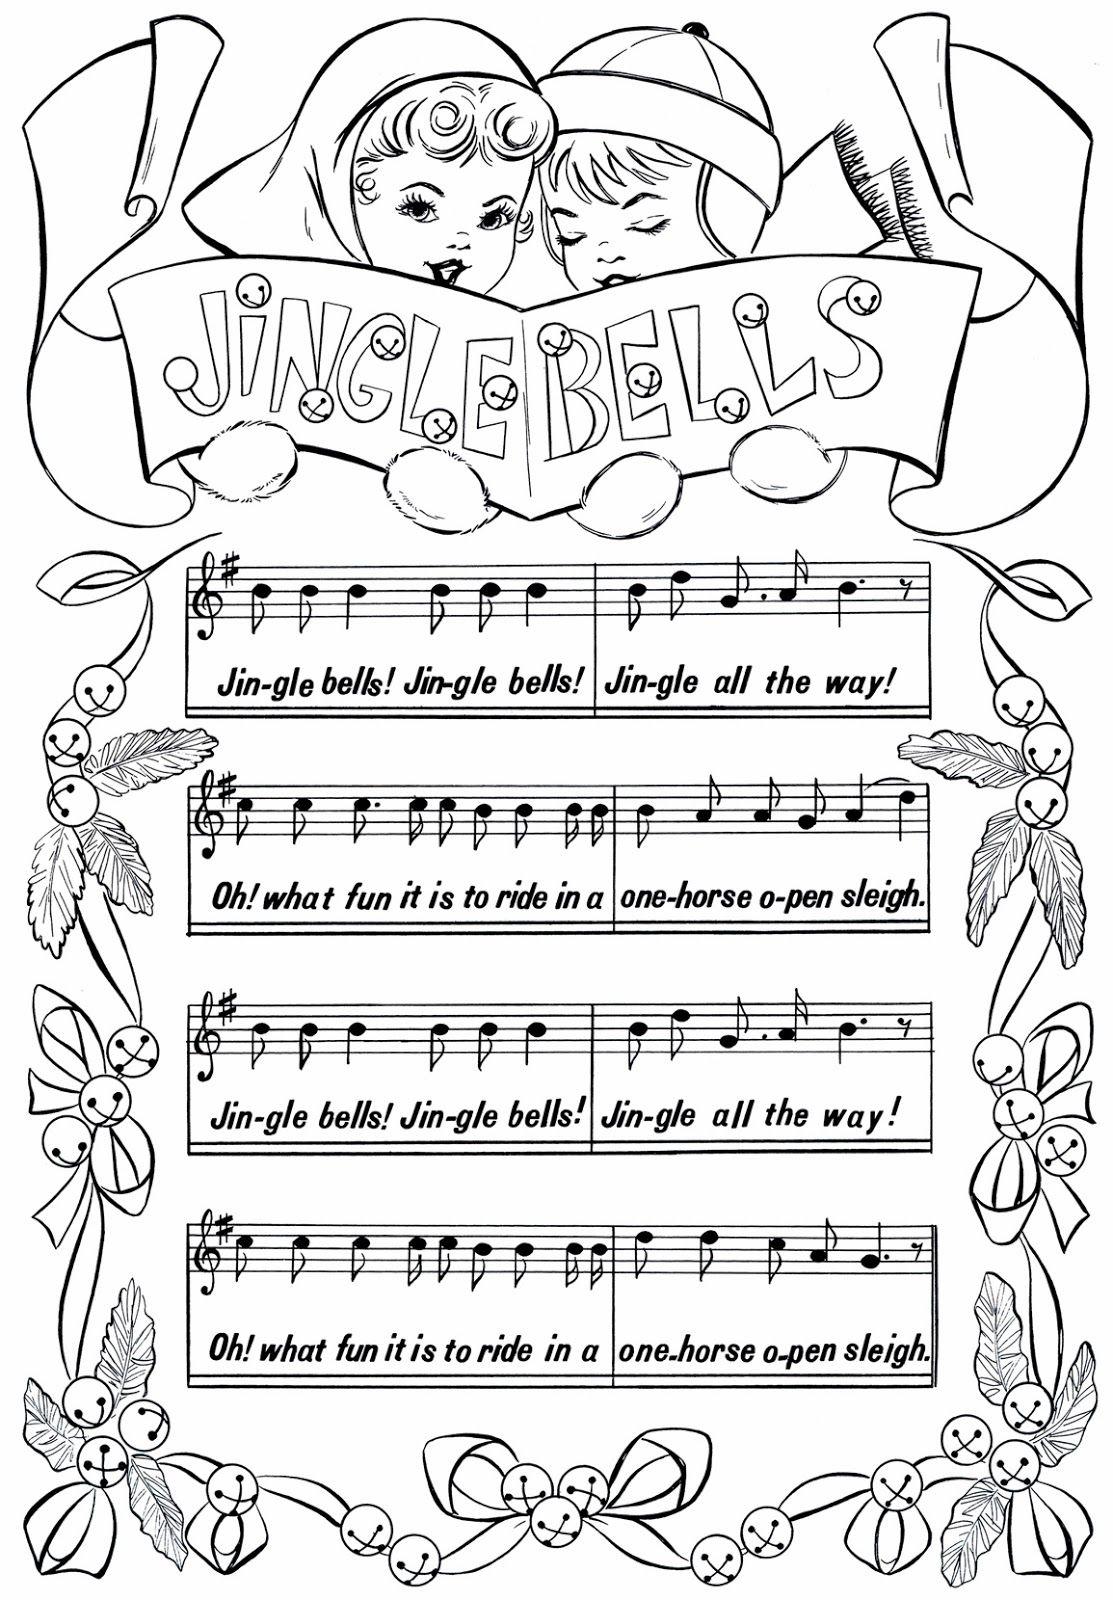 Free Printable Jingle Bells Sheet Music It is my opinion